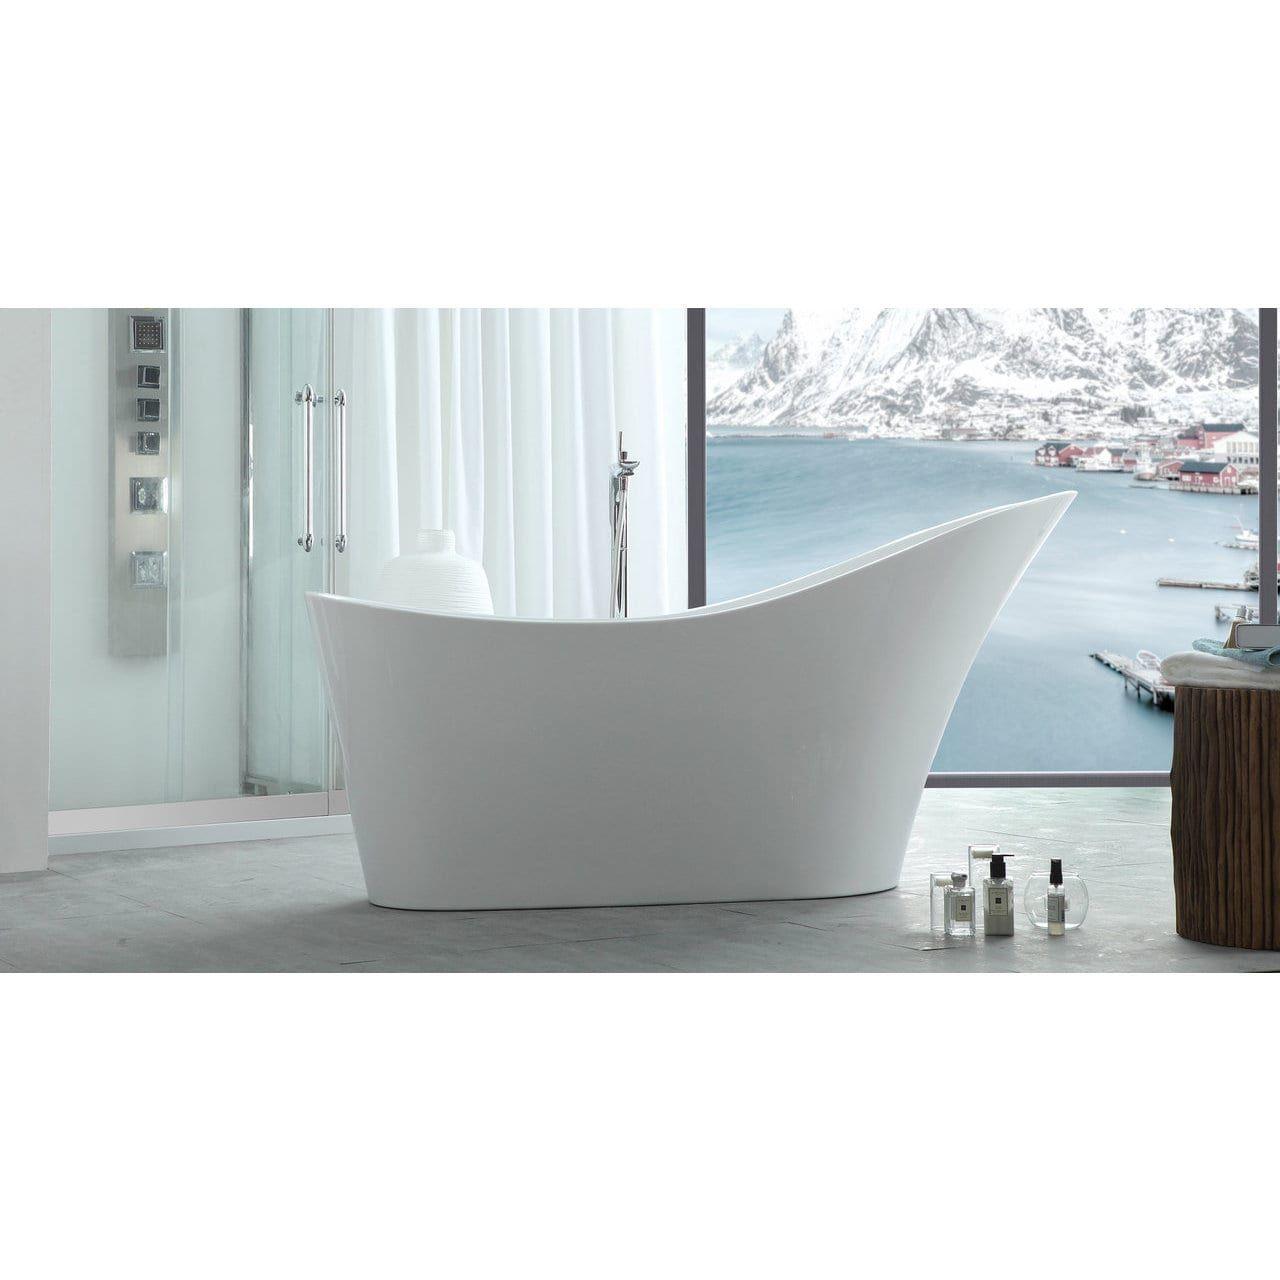 HelixBath Caracalla Modern White Freestanding Slipper Bathtub ...